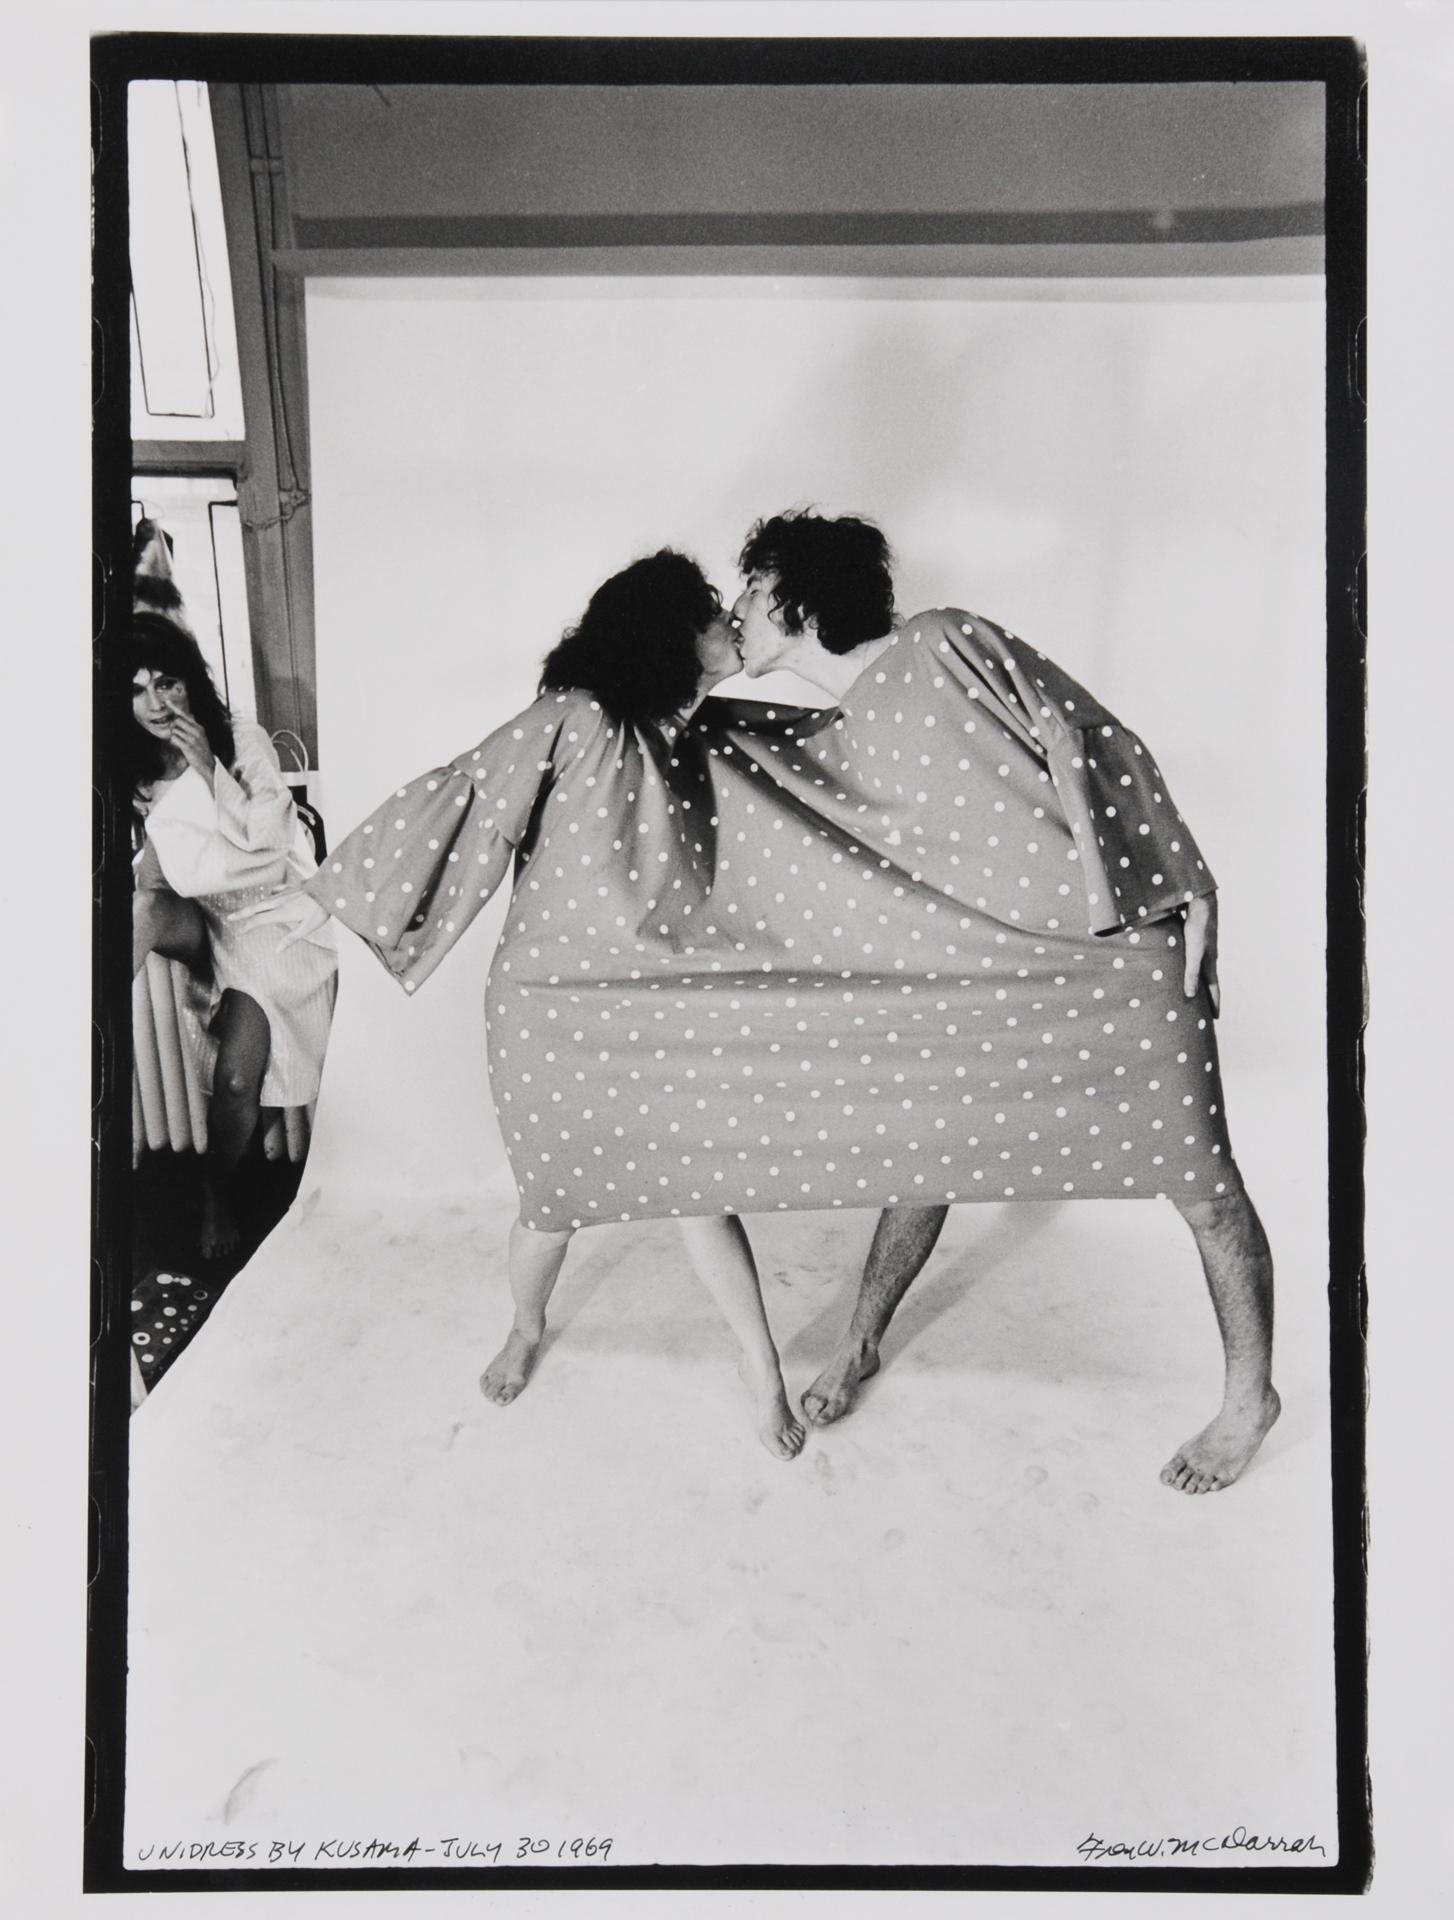 McDarrah Fred W., Unidress by Kusama, July 30, 1969